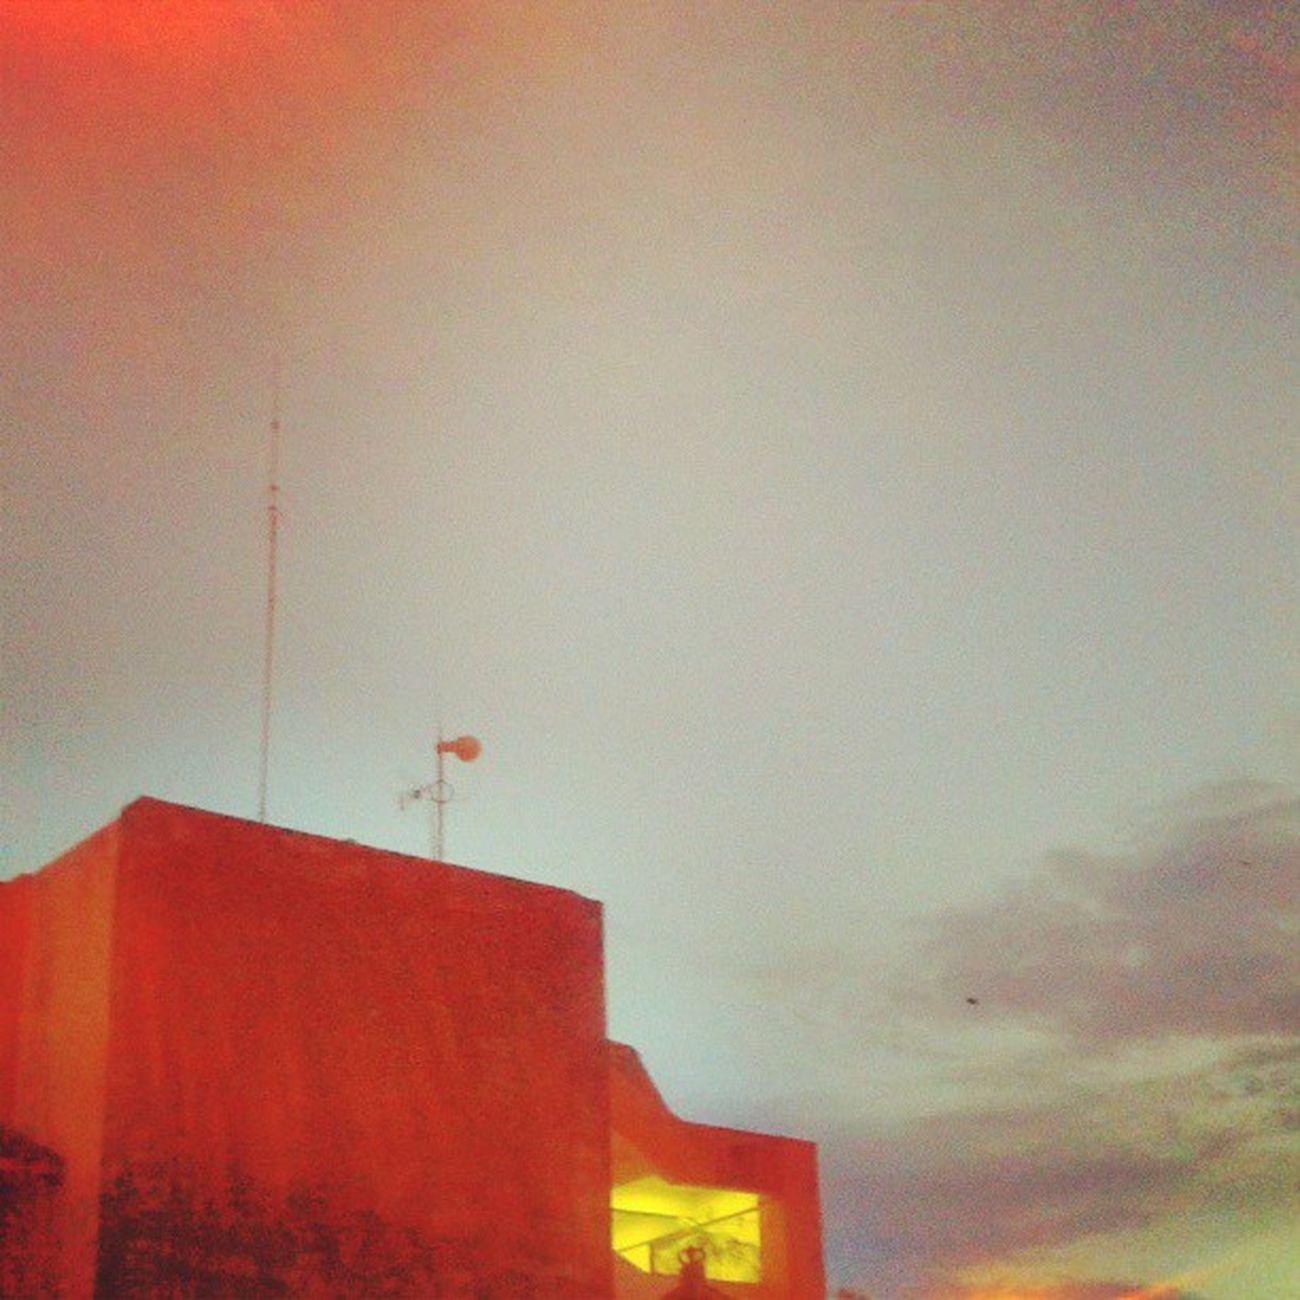 oranje Building Architecture HDR Ighdr Sunset Picoftheday Photooftheday Instanusantarabali Instanusantara Instanesia Instagood Instadaily Bali INDONESIA LangitbaliPhotoworks